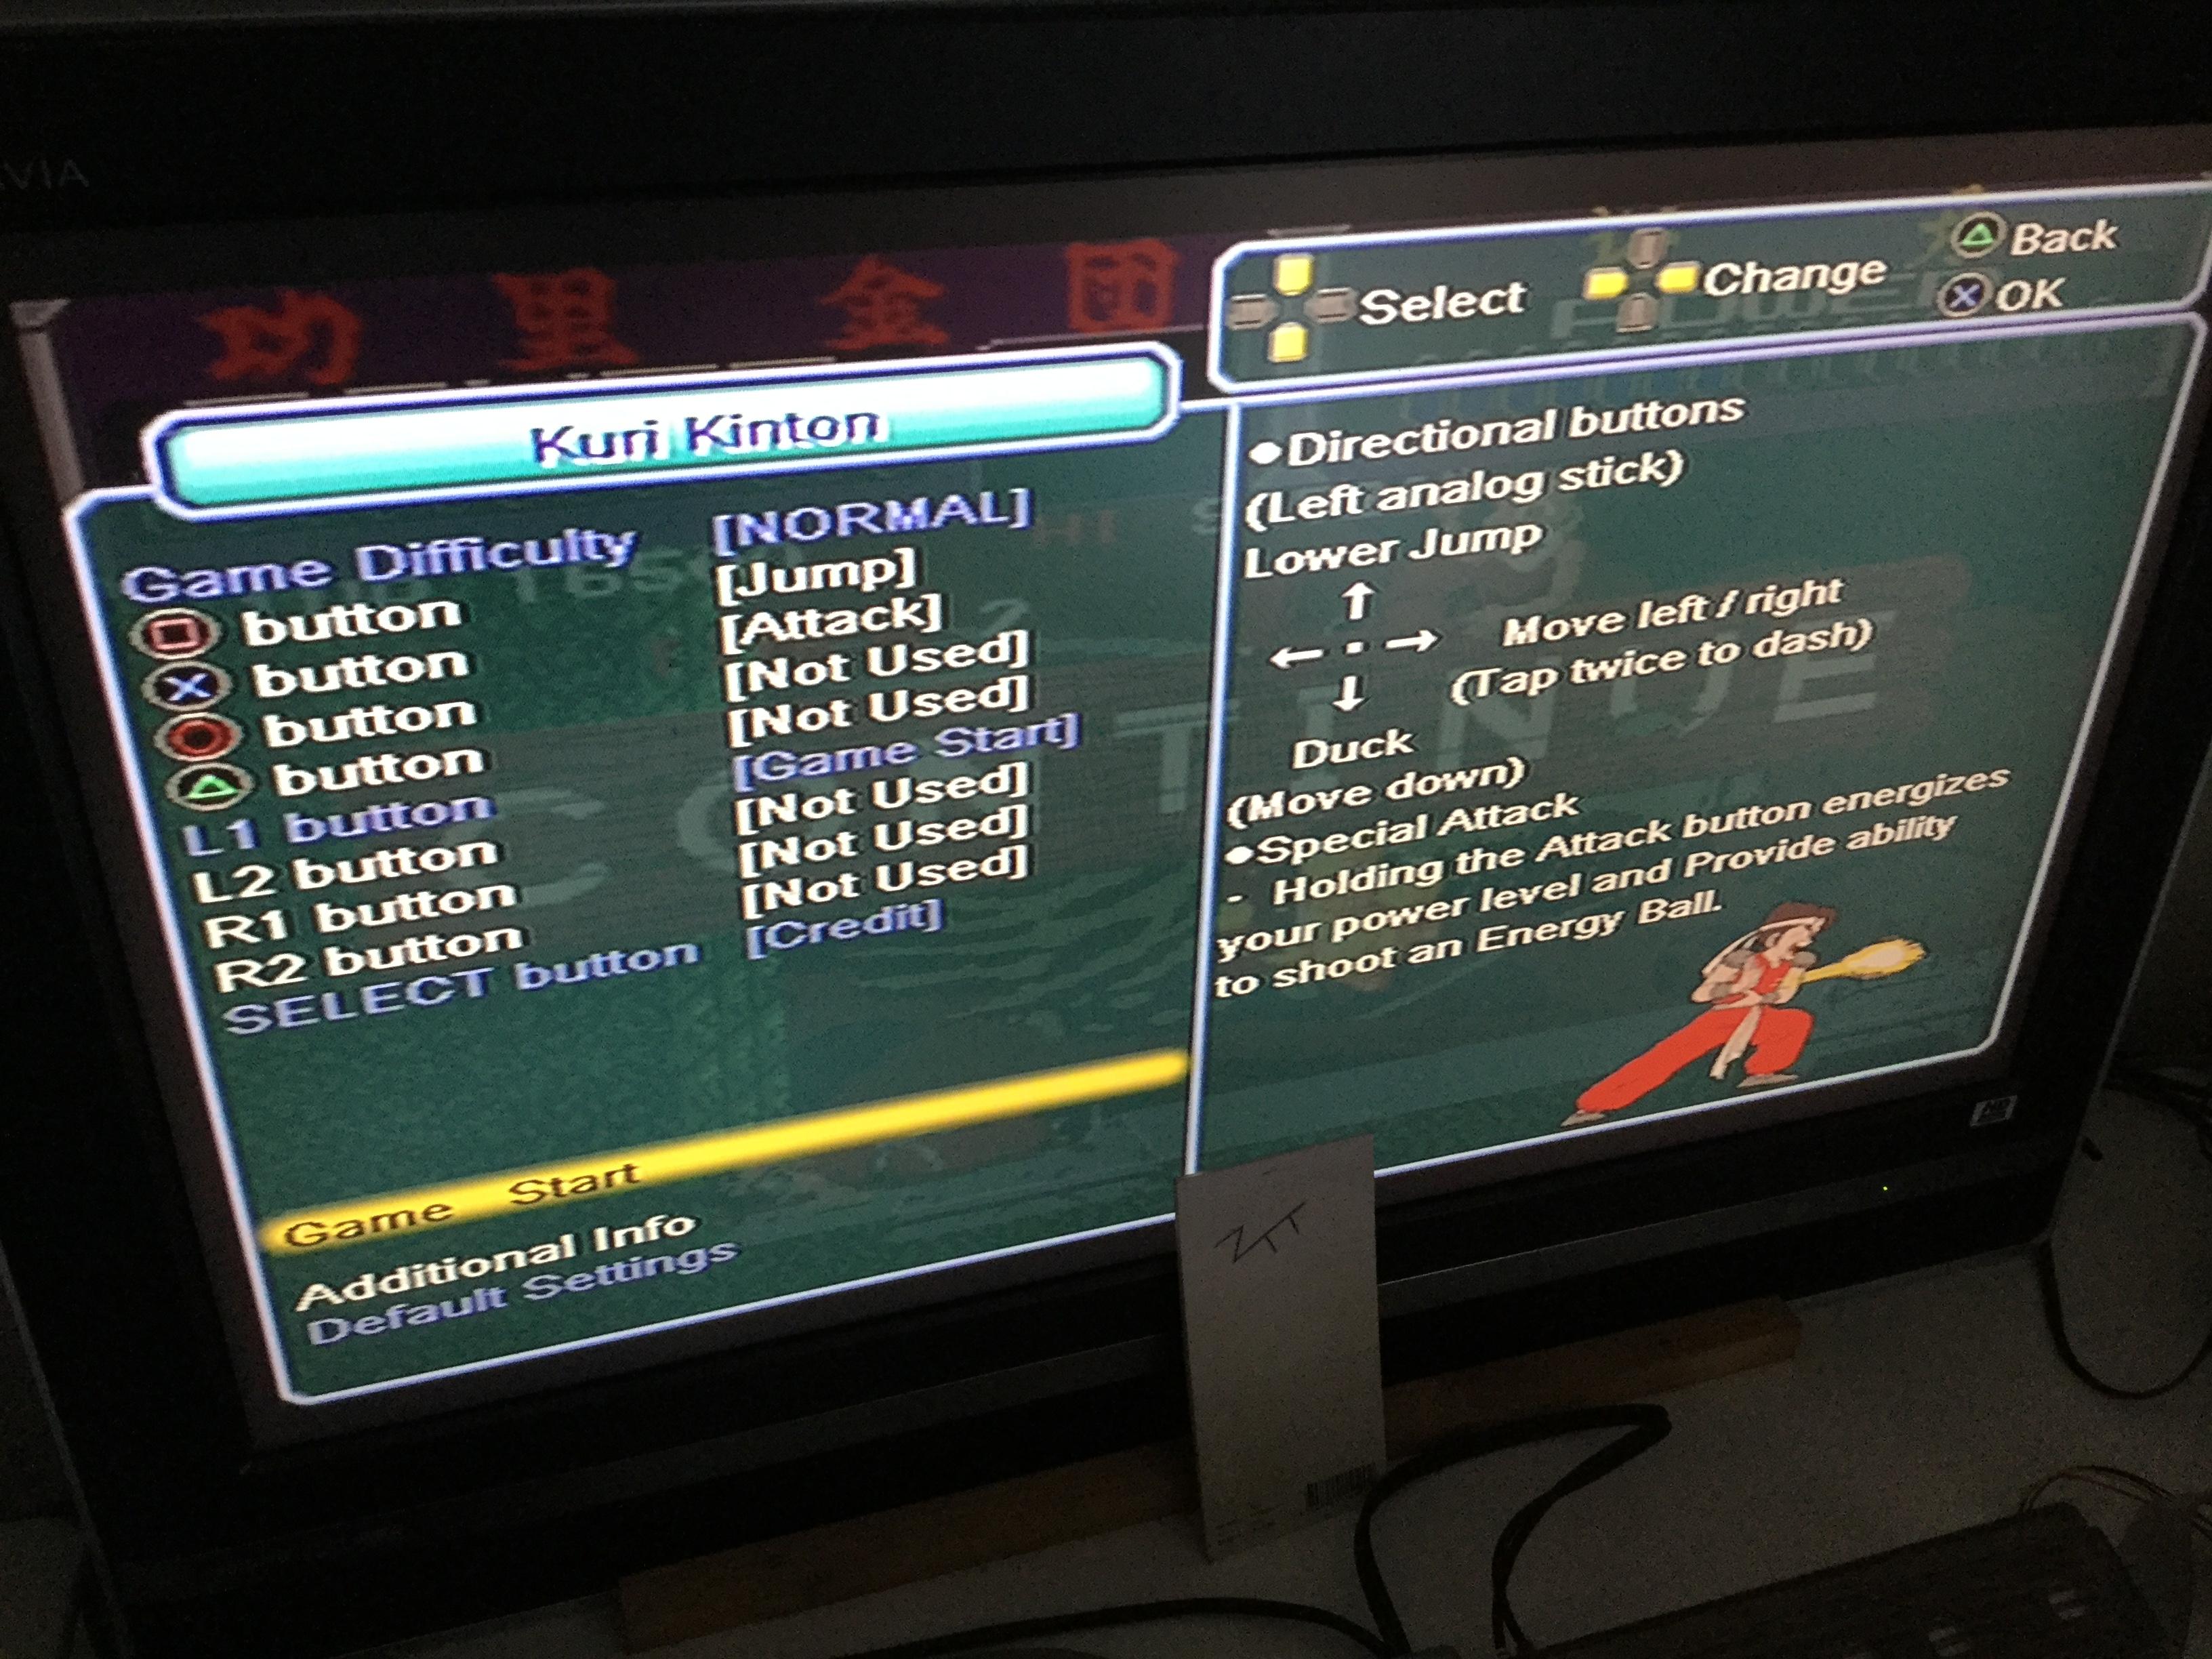 Frankie: Taito Legends 2: Kuri Kinton [Medium] (Playstation 2) 17,000 points on 2018-01-04 07:19:42